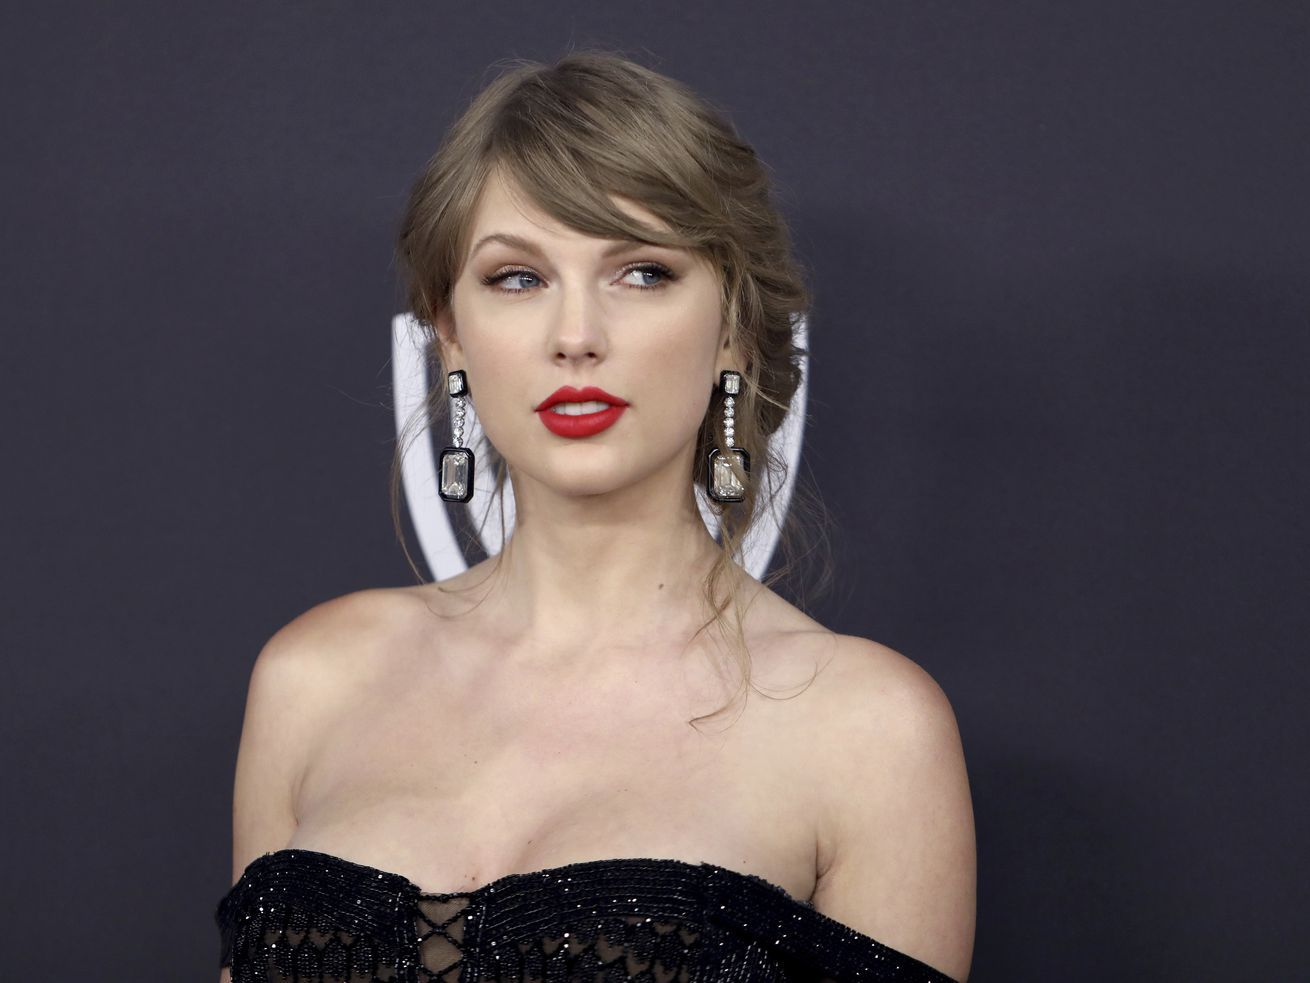 Coronavirus: Taylor Swift, Ariana Grande are sending money to fans in need